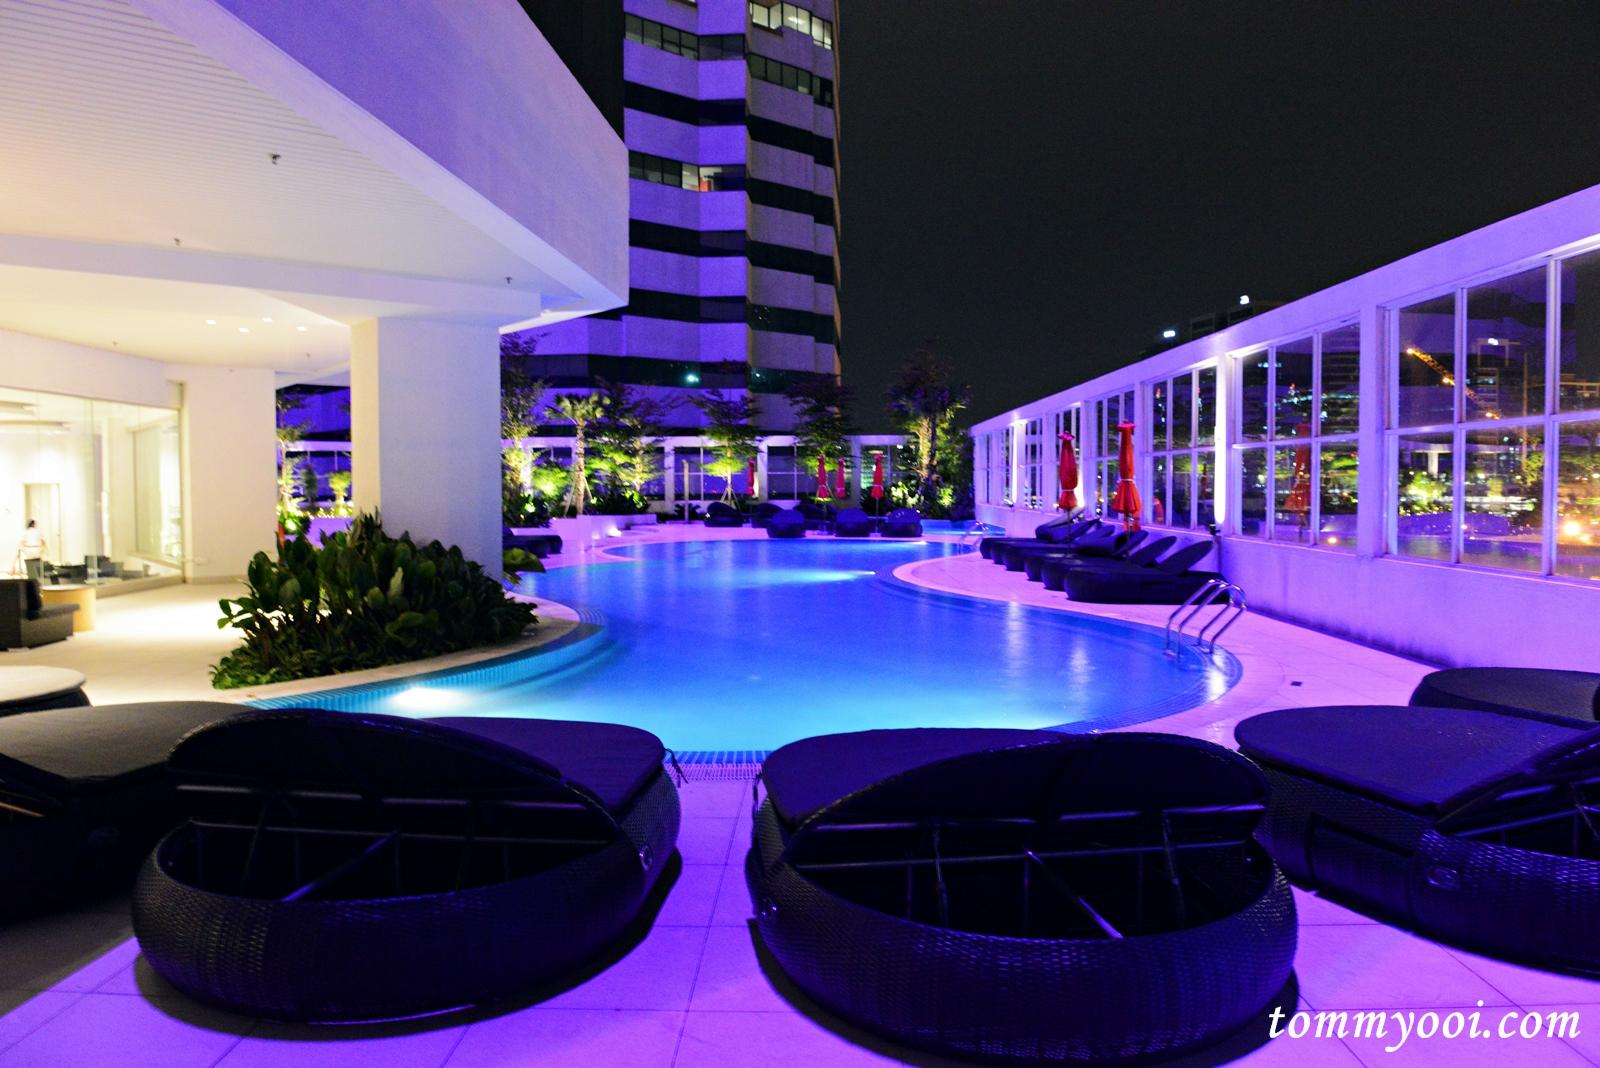 Pullman kuala lumpur bangsar tommy ooi travel guide - Piccolo hotel kuala lumpur swimming pool ...